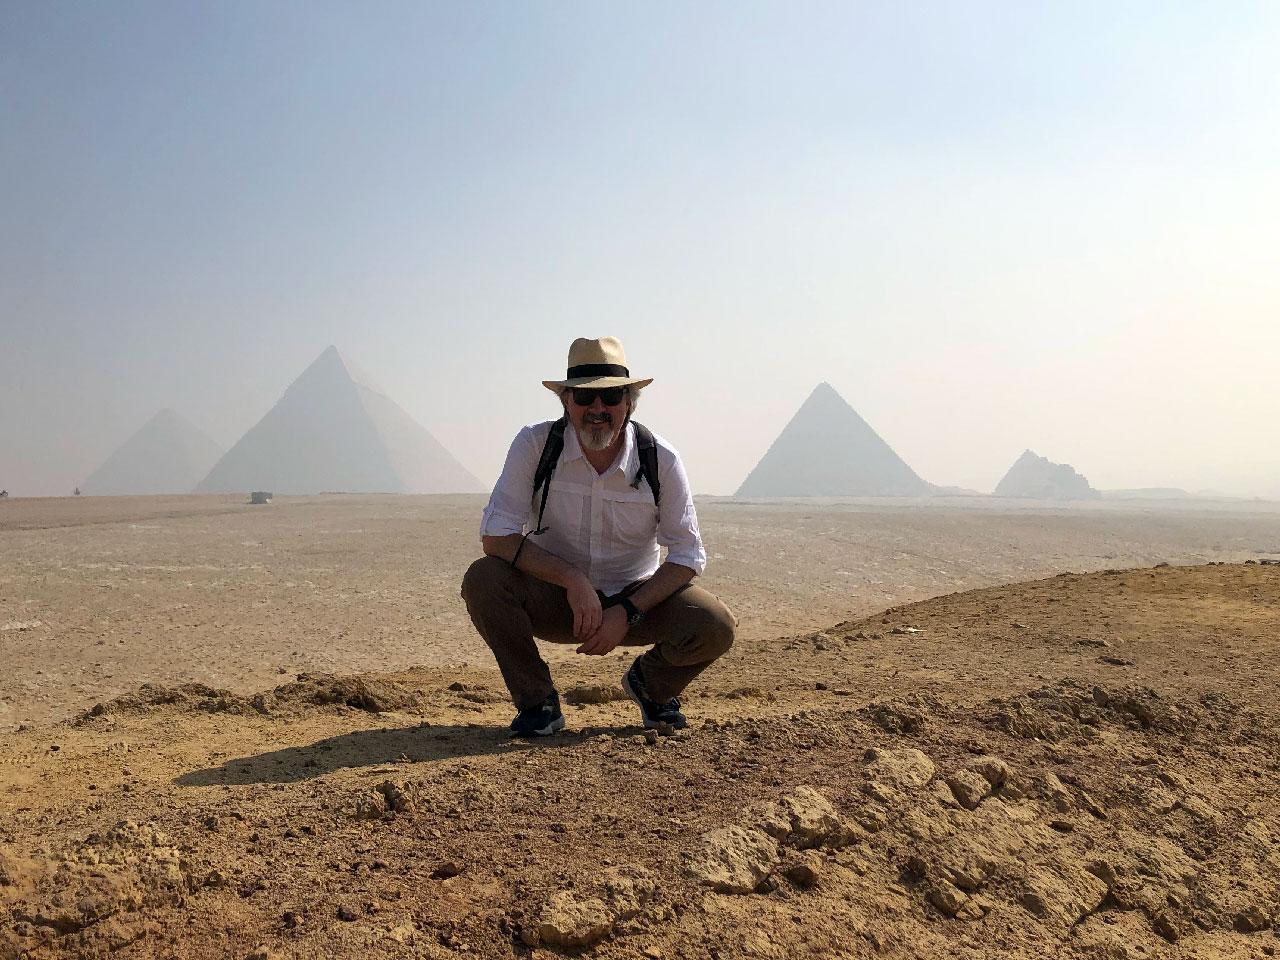 Larry Taunton in Egypt - Pyramids